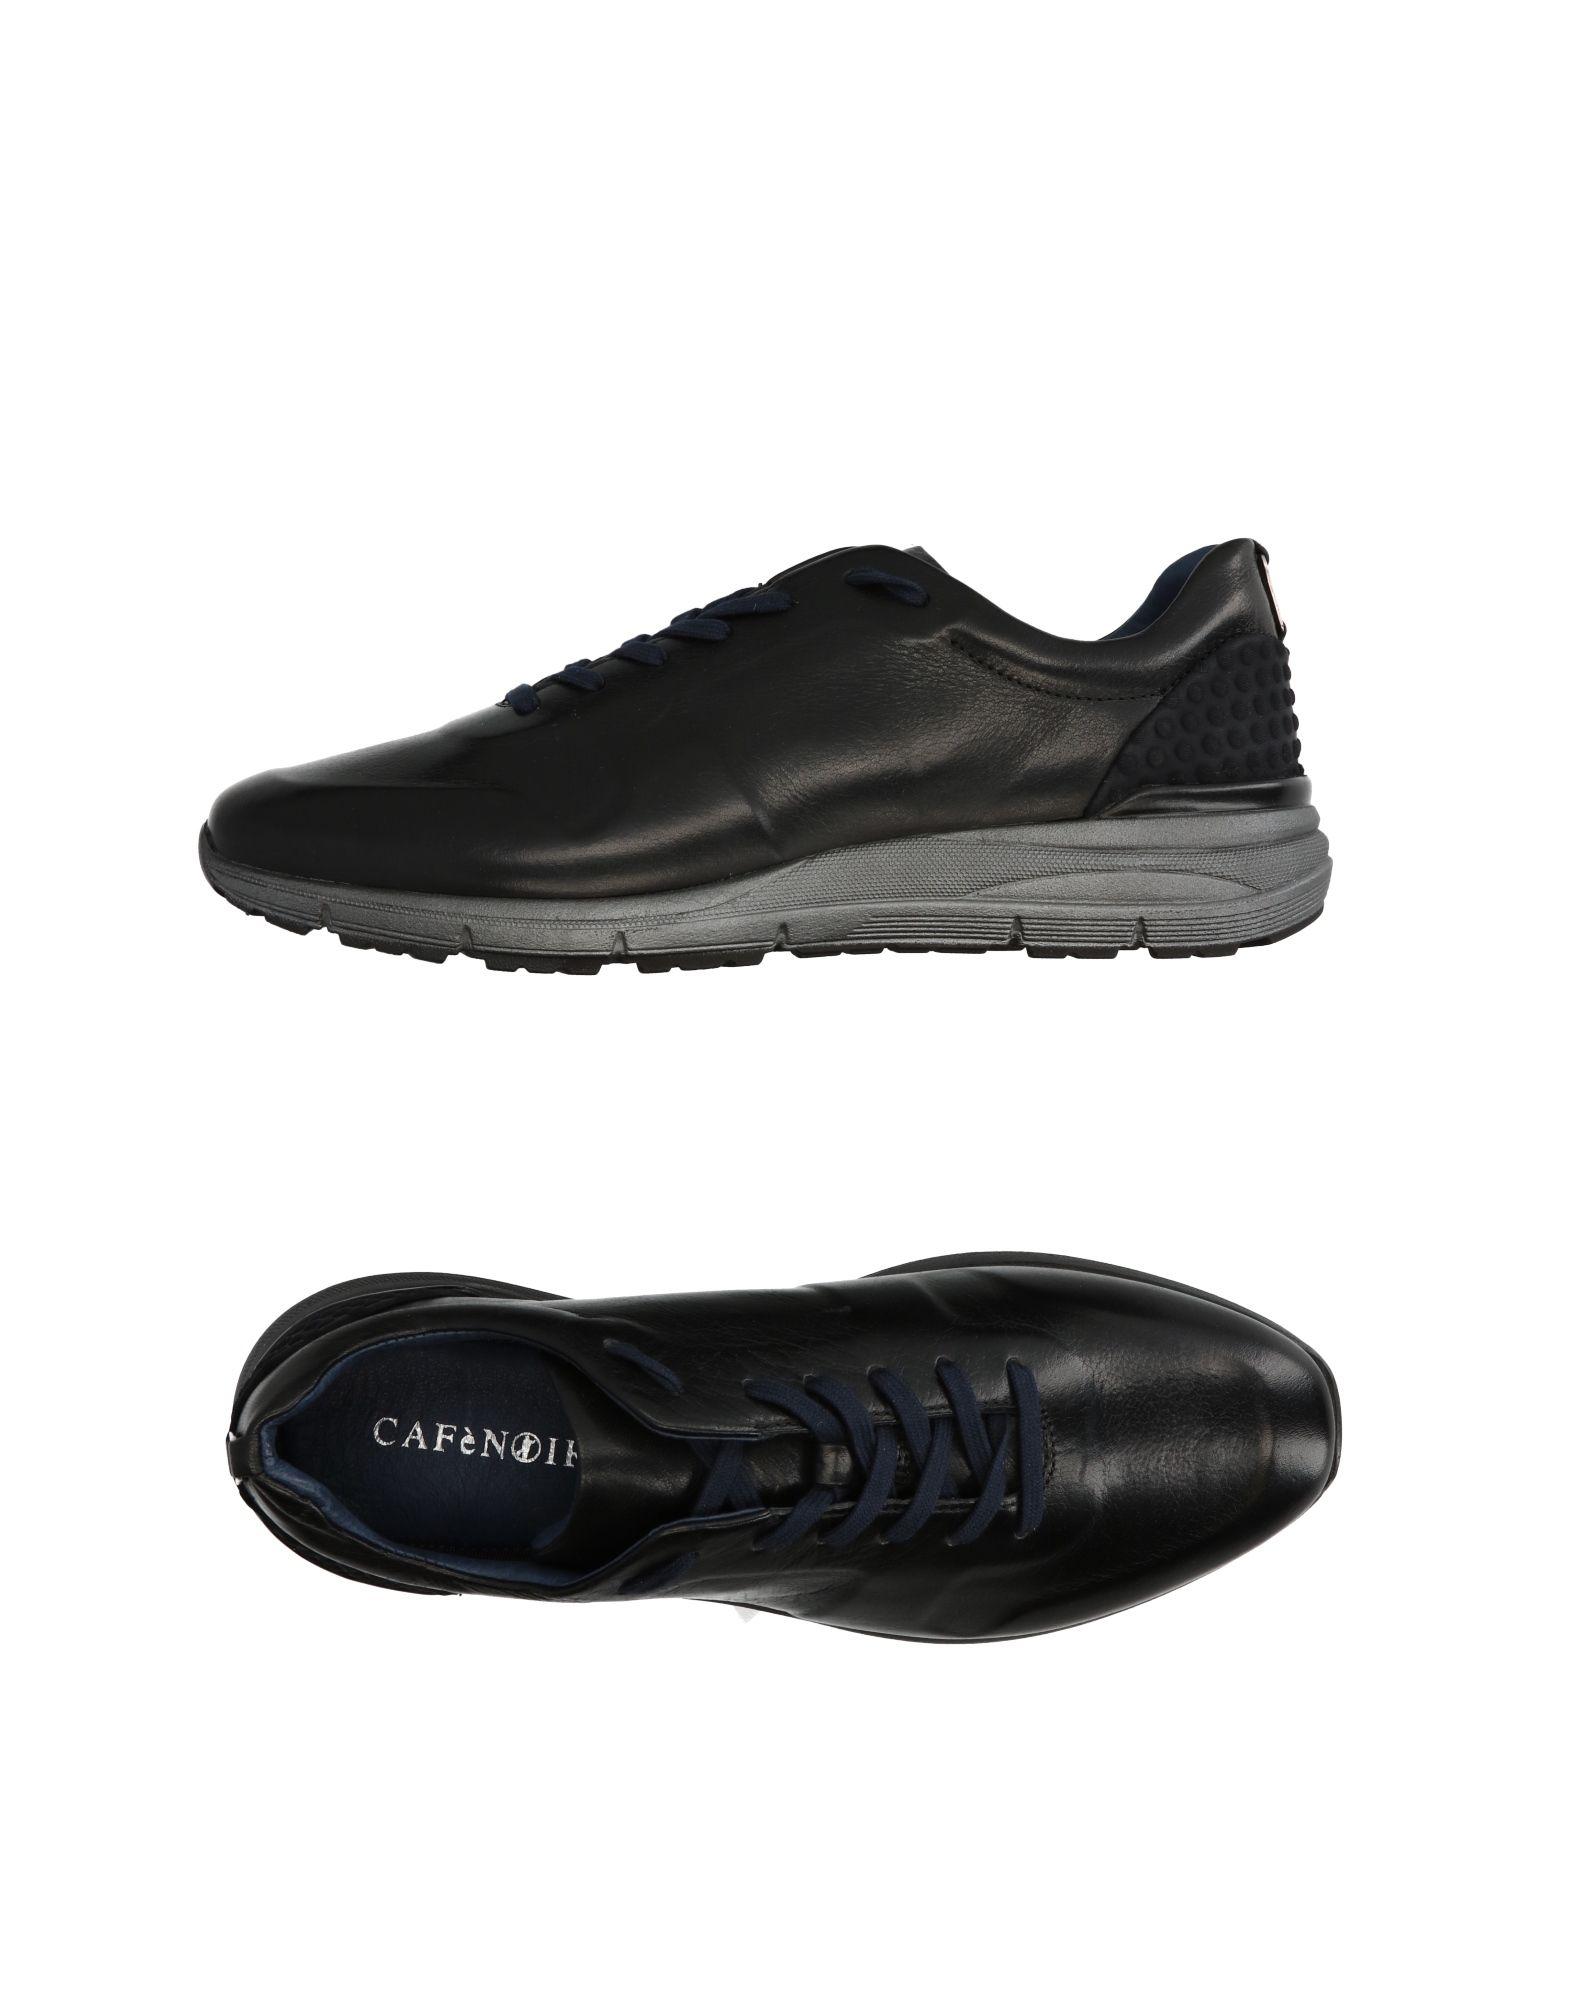 Rabatt Rabatt Rabatt echte Schuhe Cafènoir Sneakers Herren  11299221EG 636b07